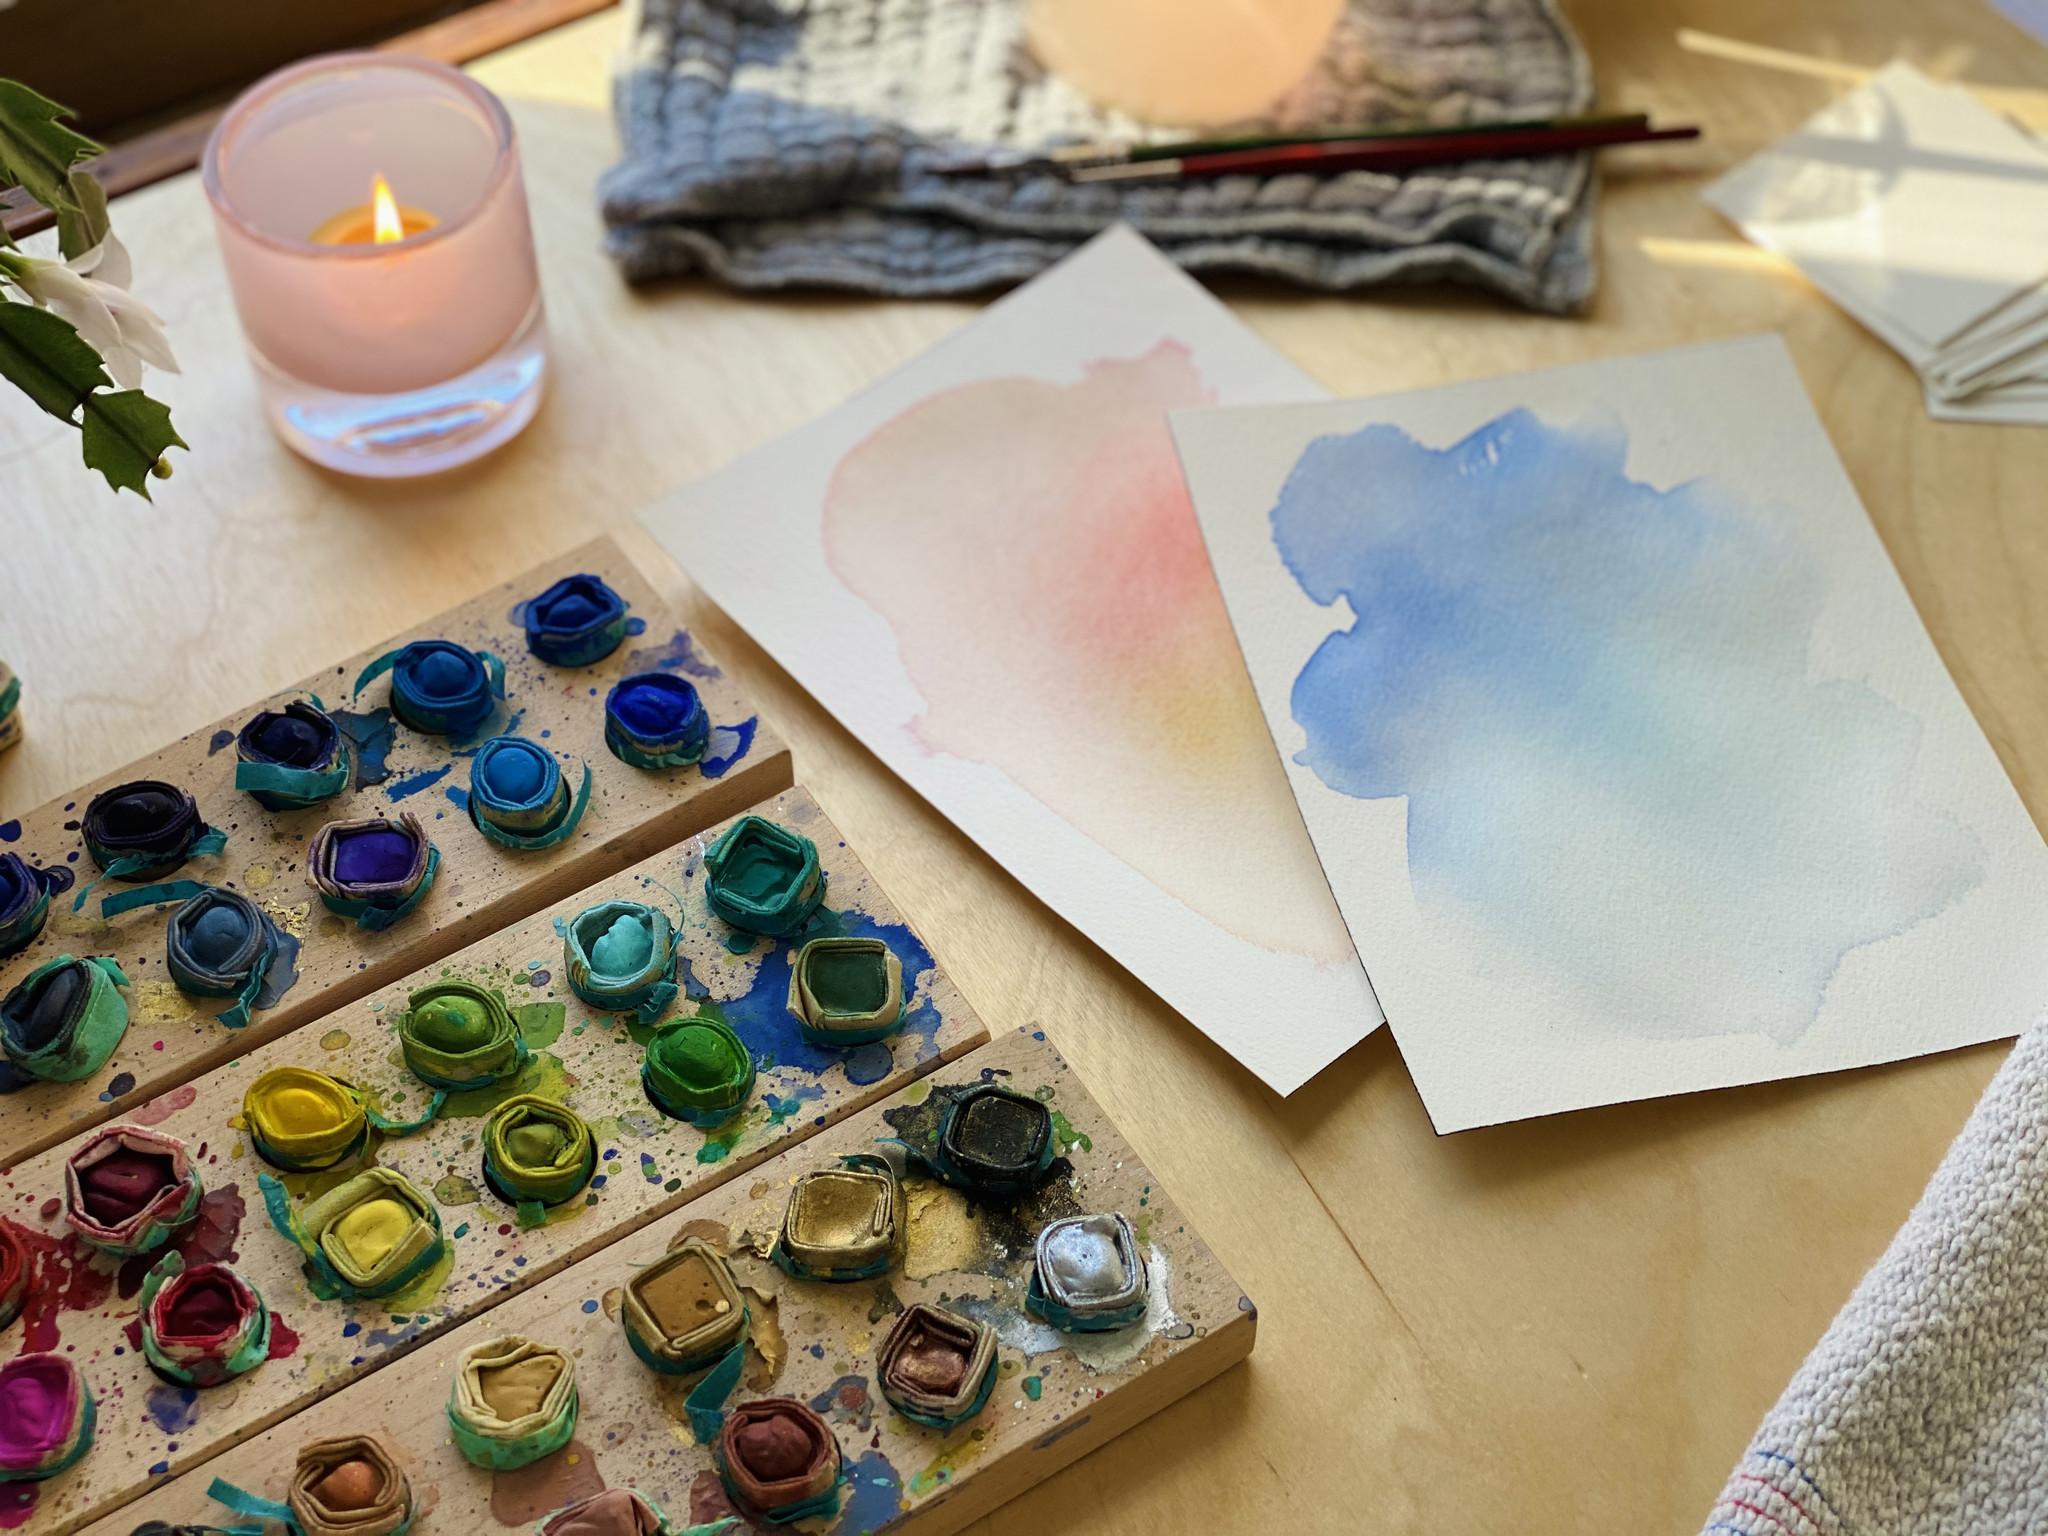 Watercolor 101: Exploring Meditative Color For Beginners